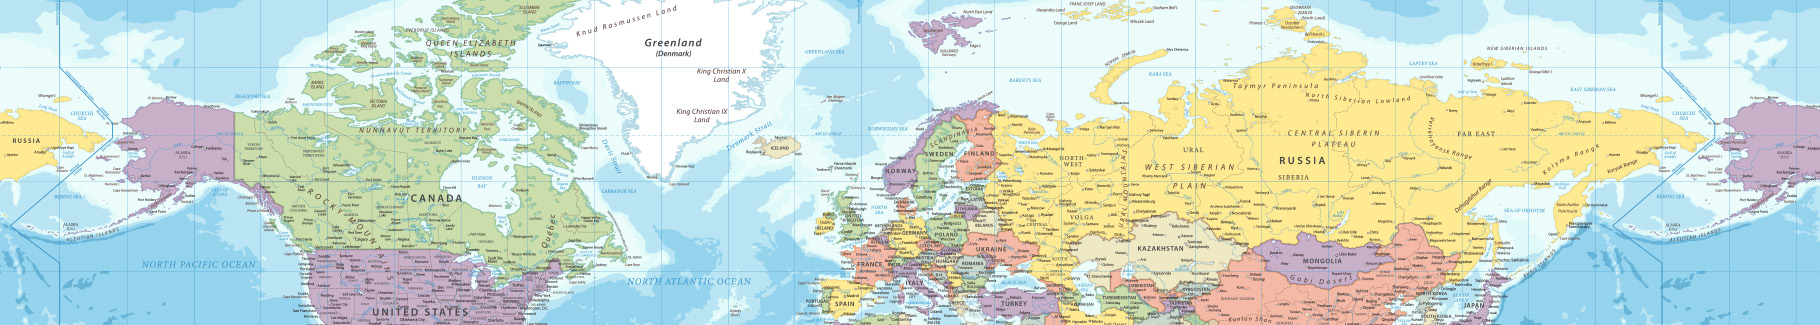 Obraz retro mapa do salonu